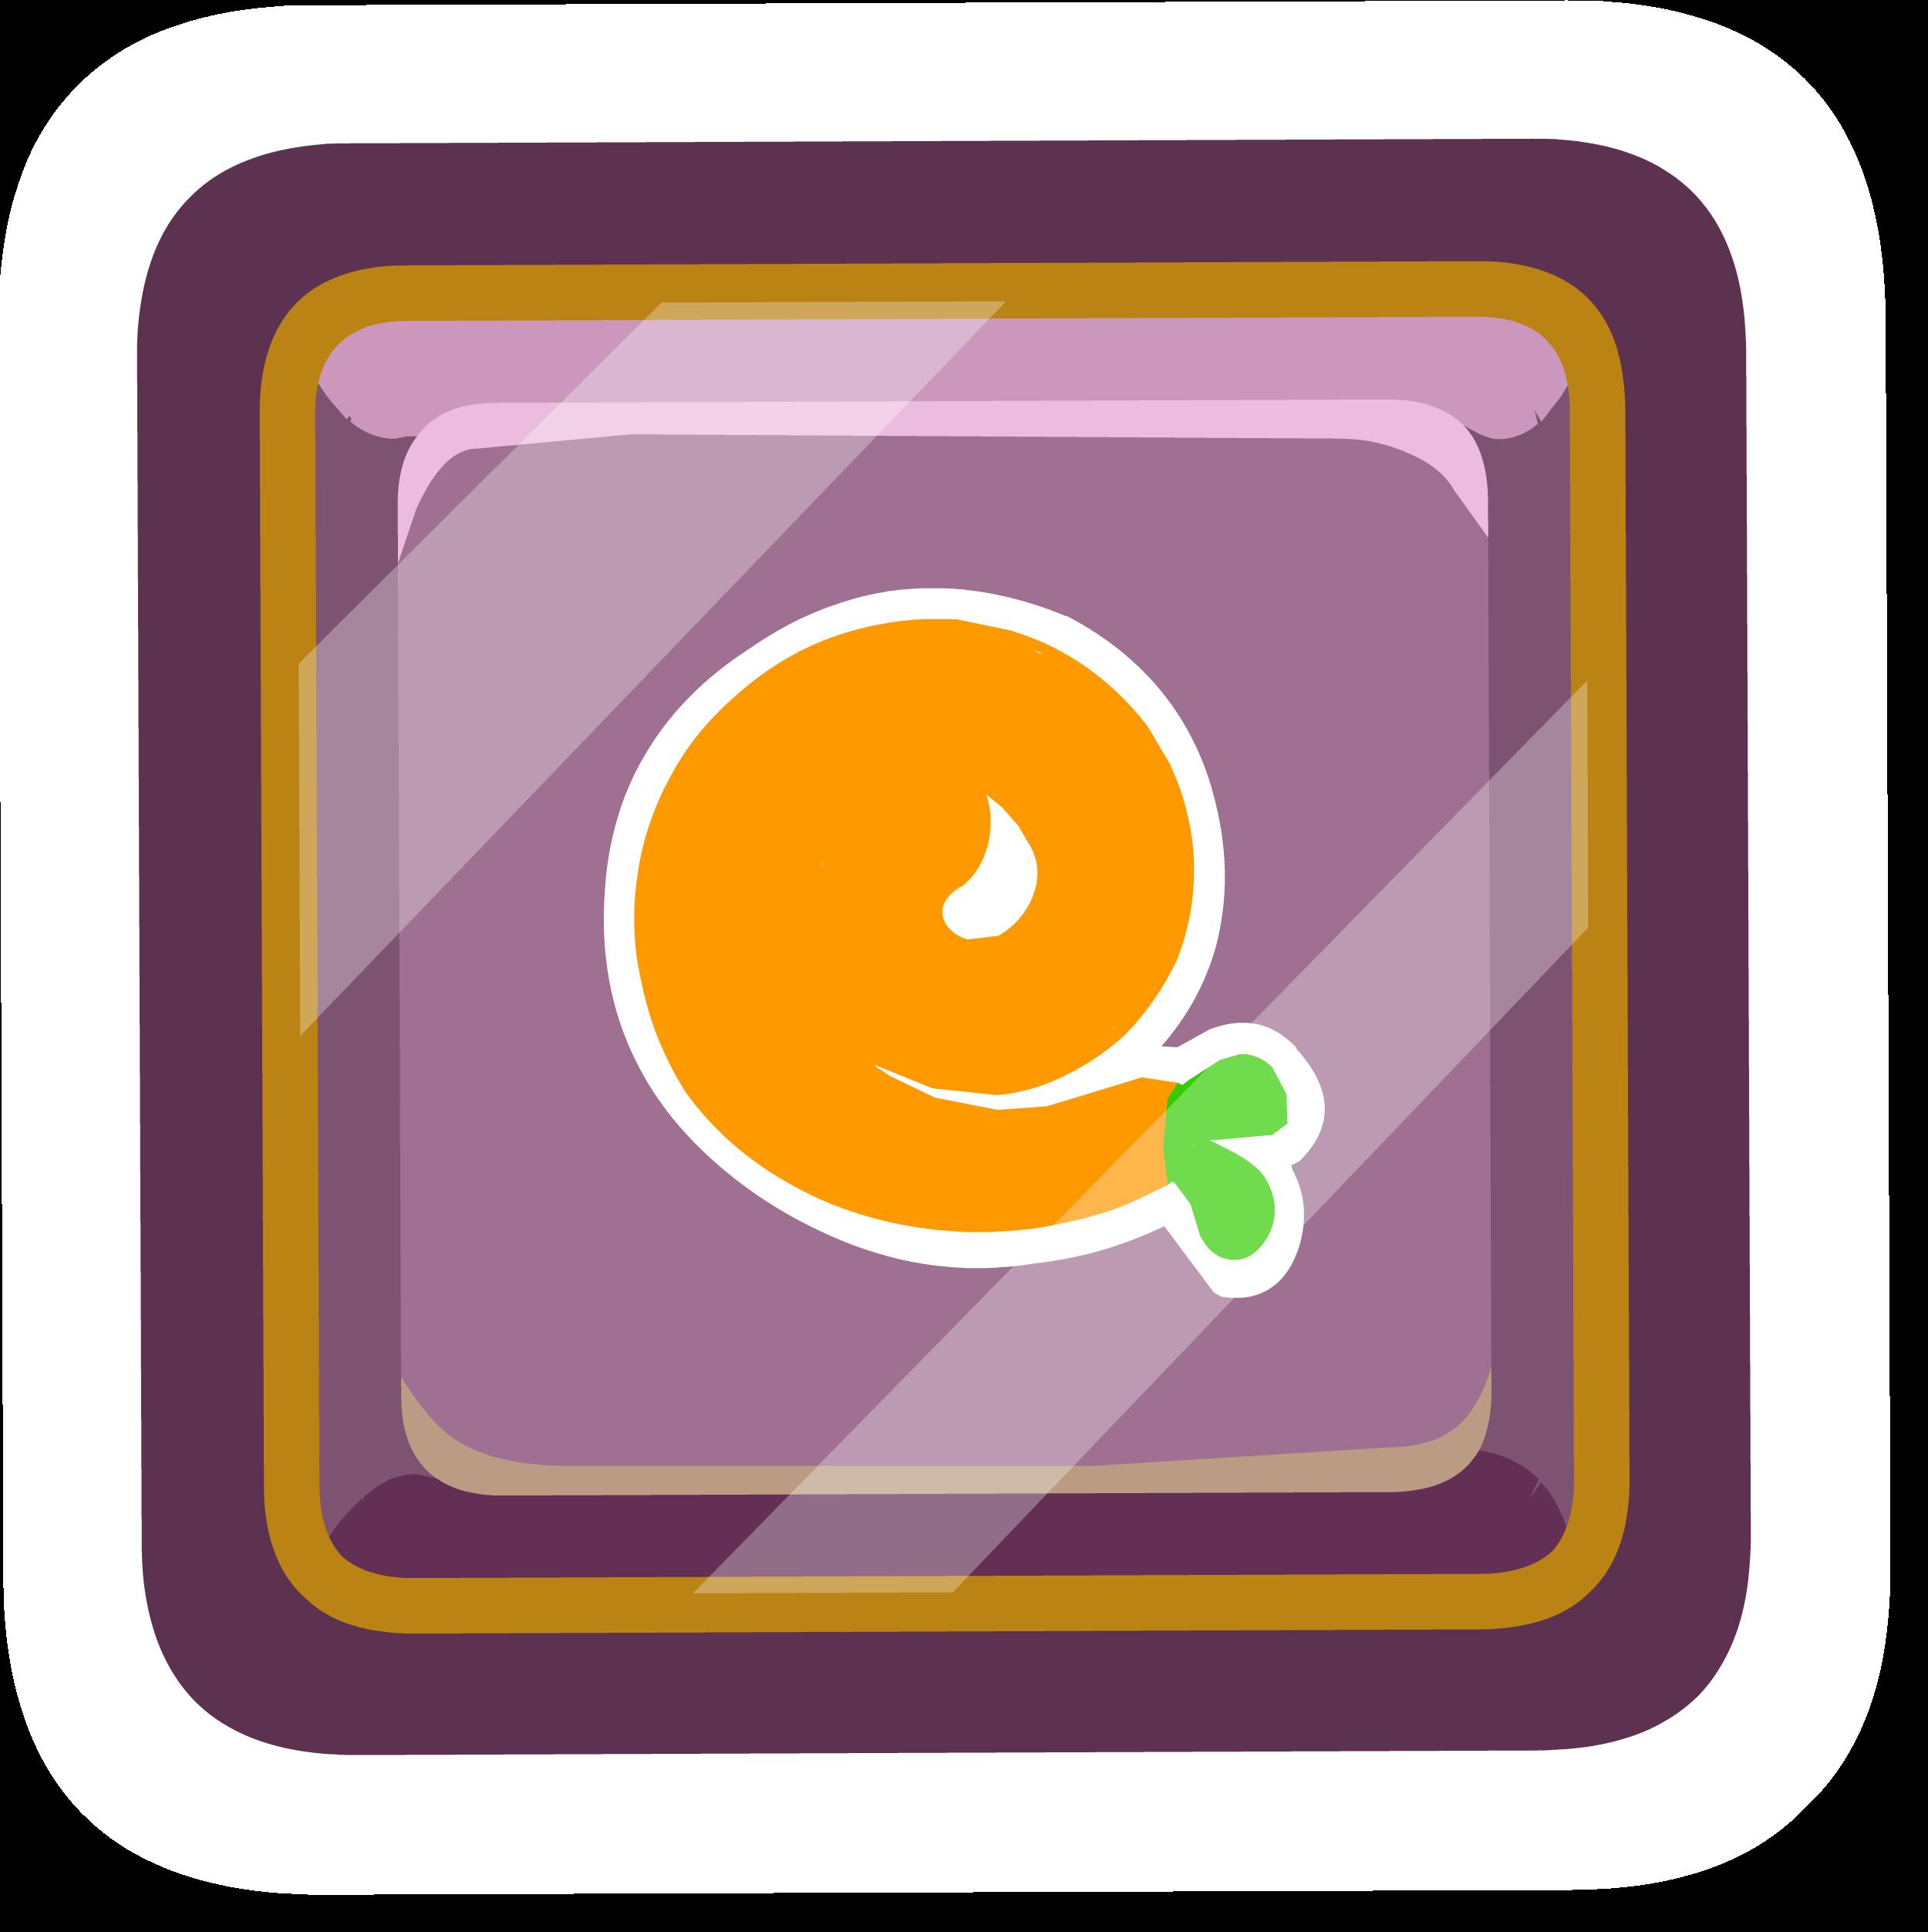 Pin de Puffito Naranja